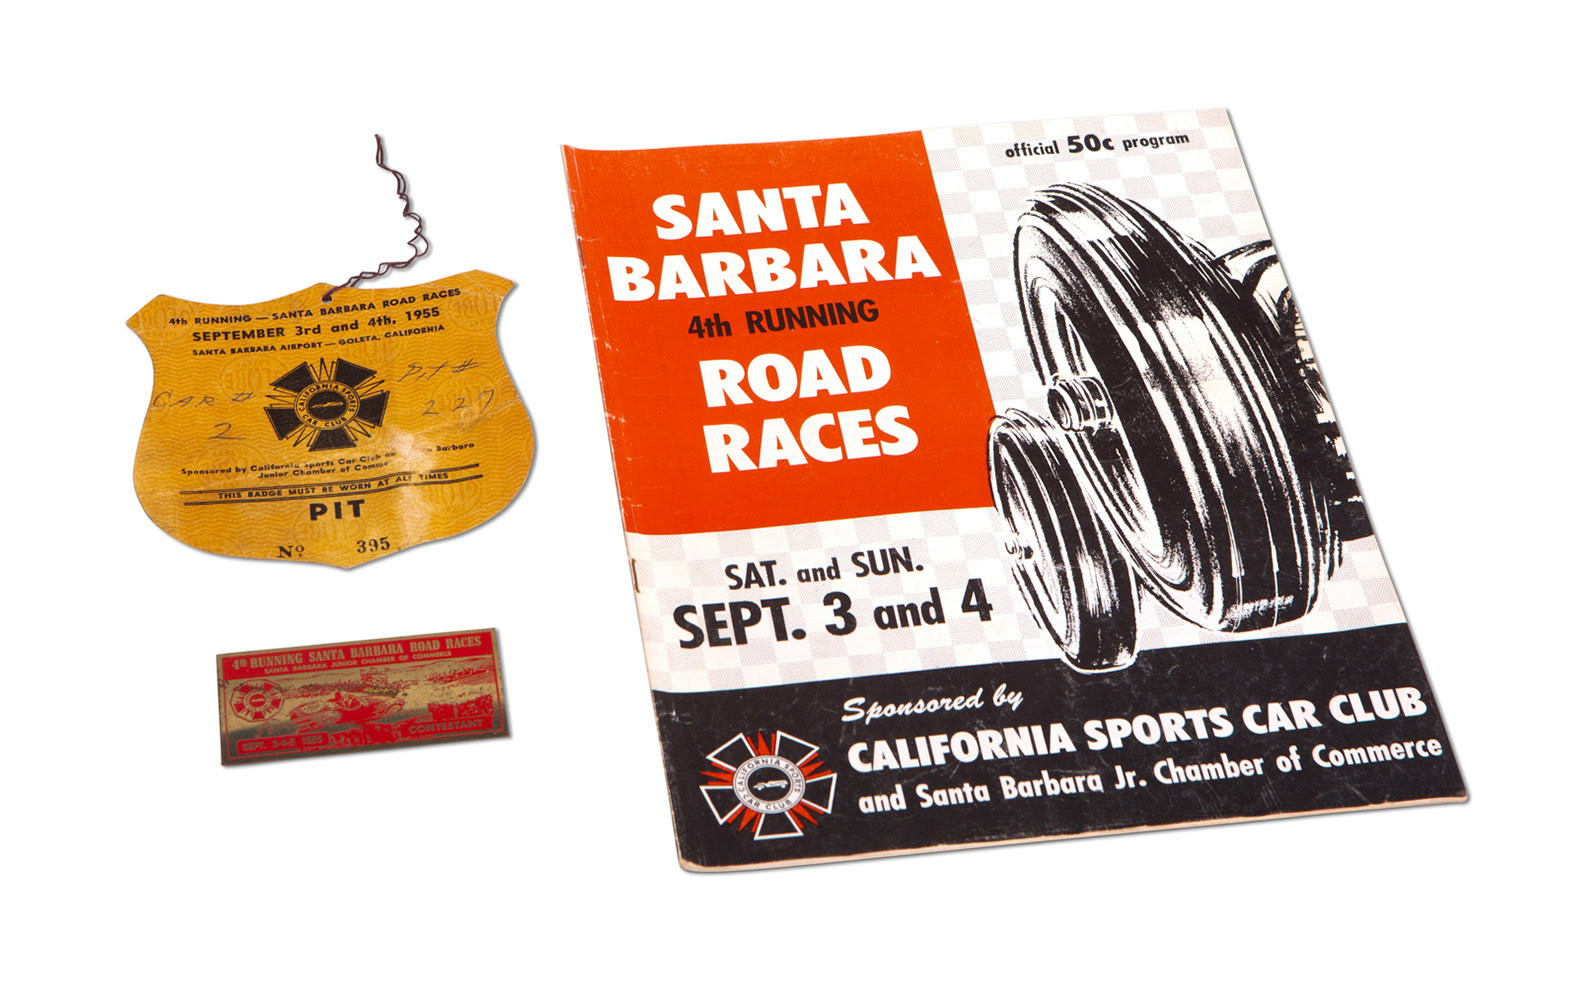 1955 Santa Barbara Road Races Official Program, Contestant Badge, and Pit Pass